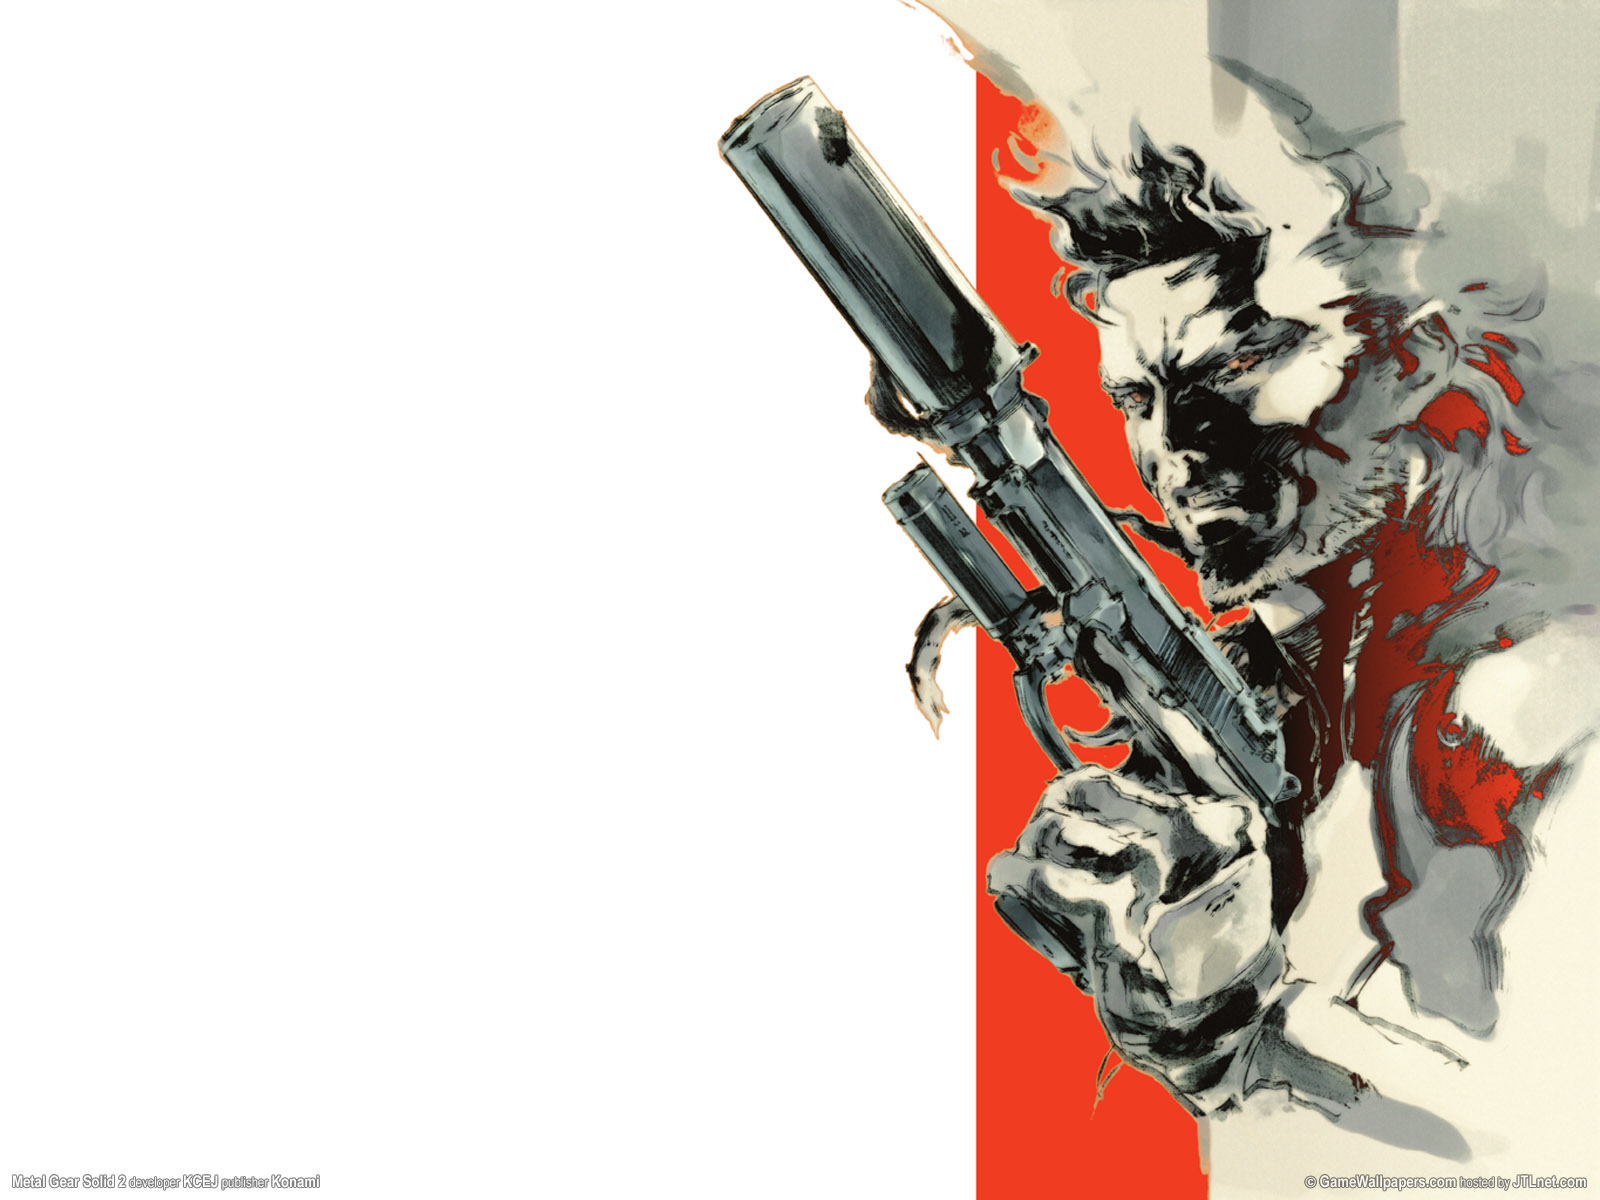 Raiden Mgs2 Hd Metal Gear Solid 2 Wal...